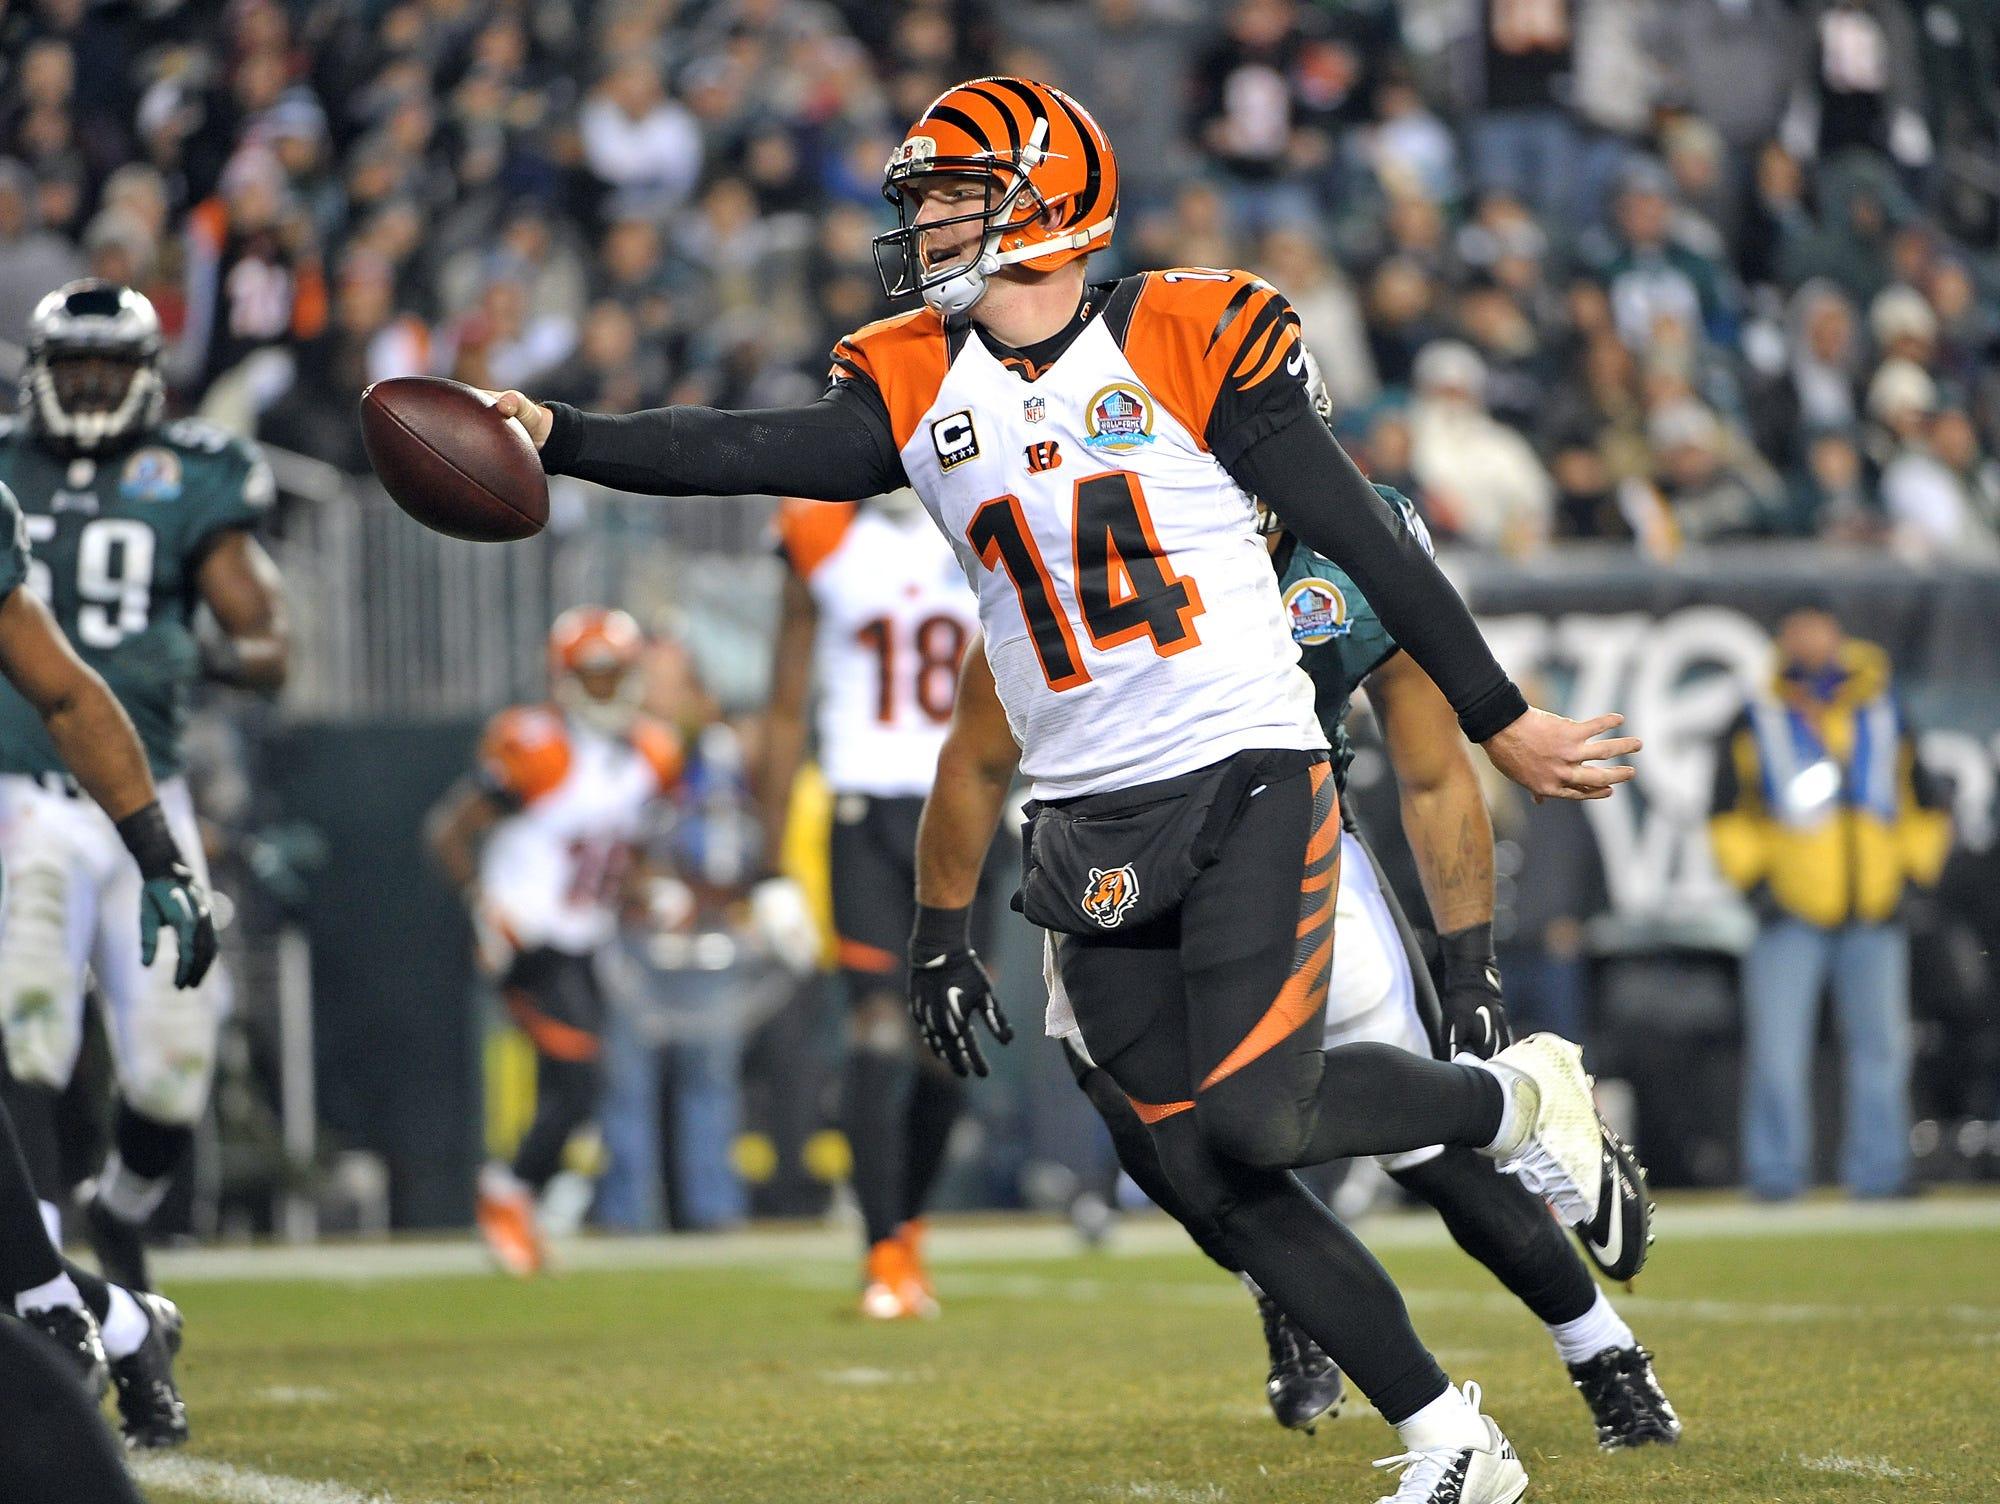 13. Andy Dalton, Cincinnati Bengals